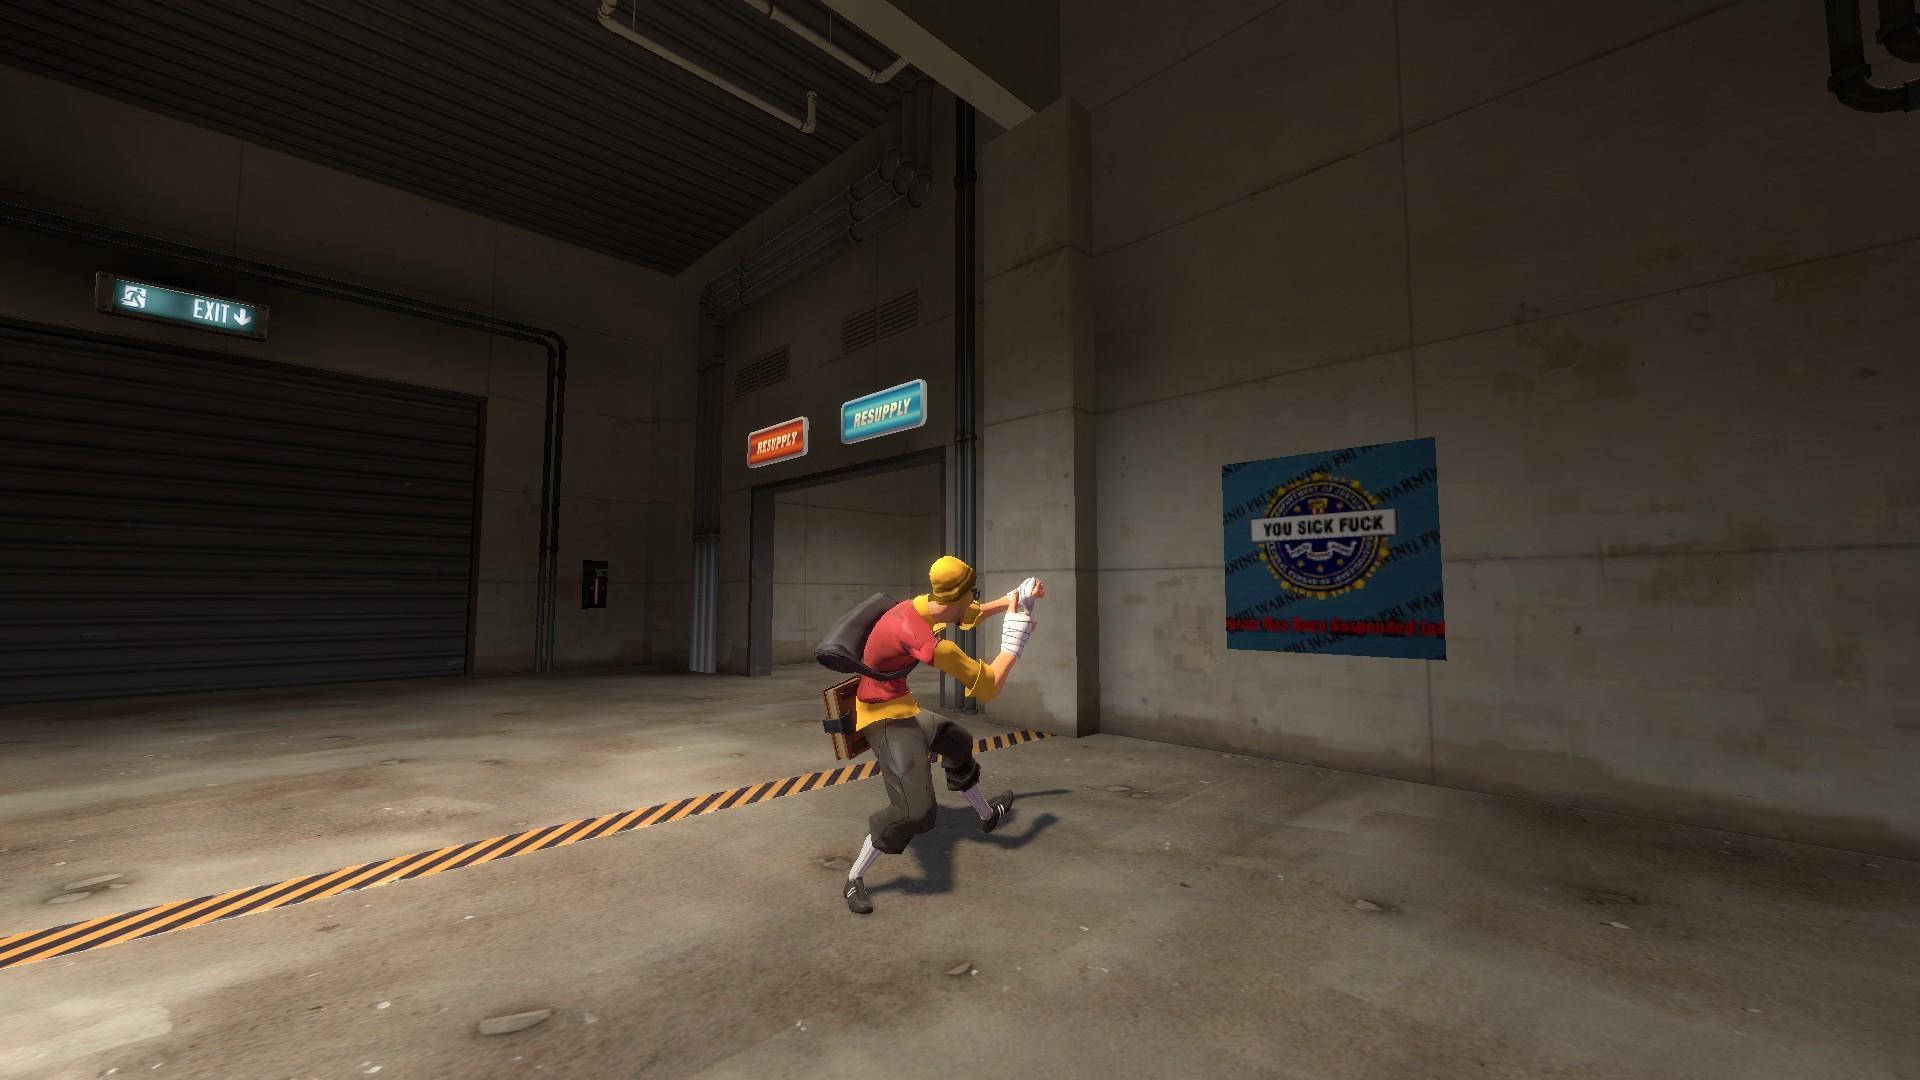 Jontron YOU SICK FUCK Spray [Team Fortress 2] [Sprays]